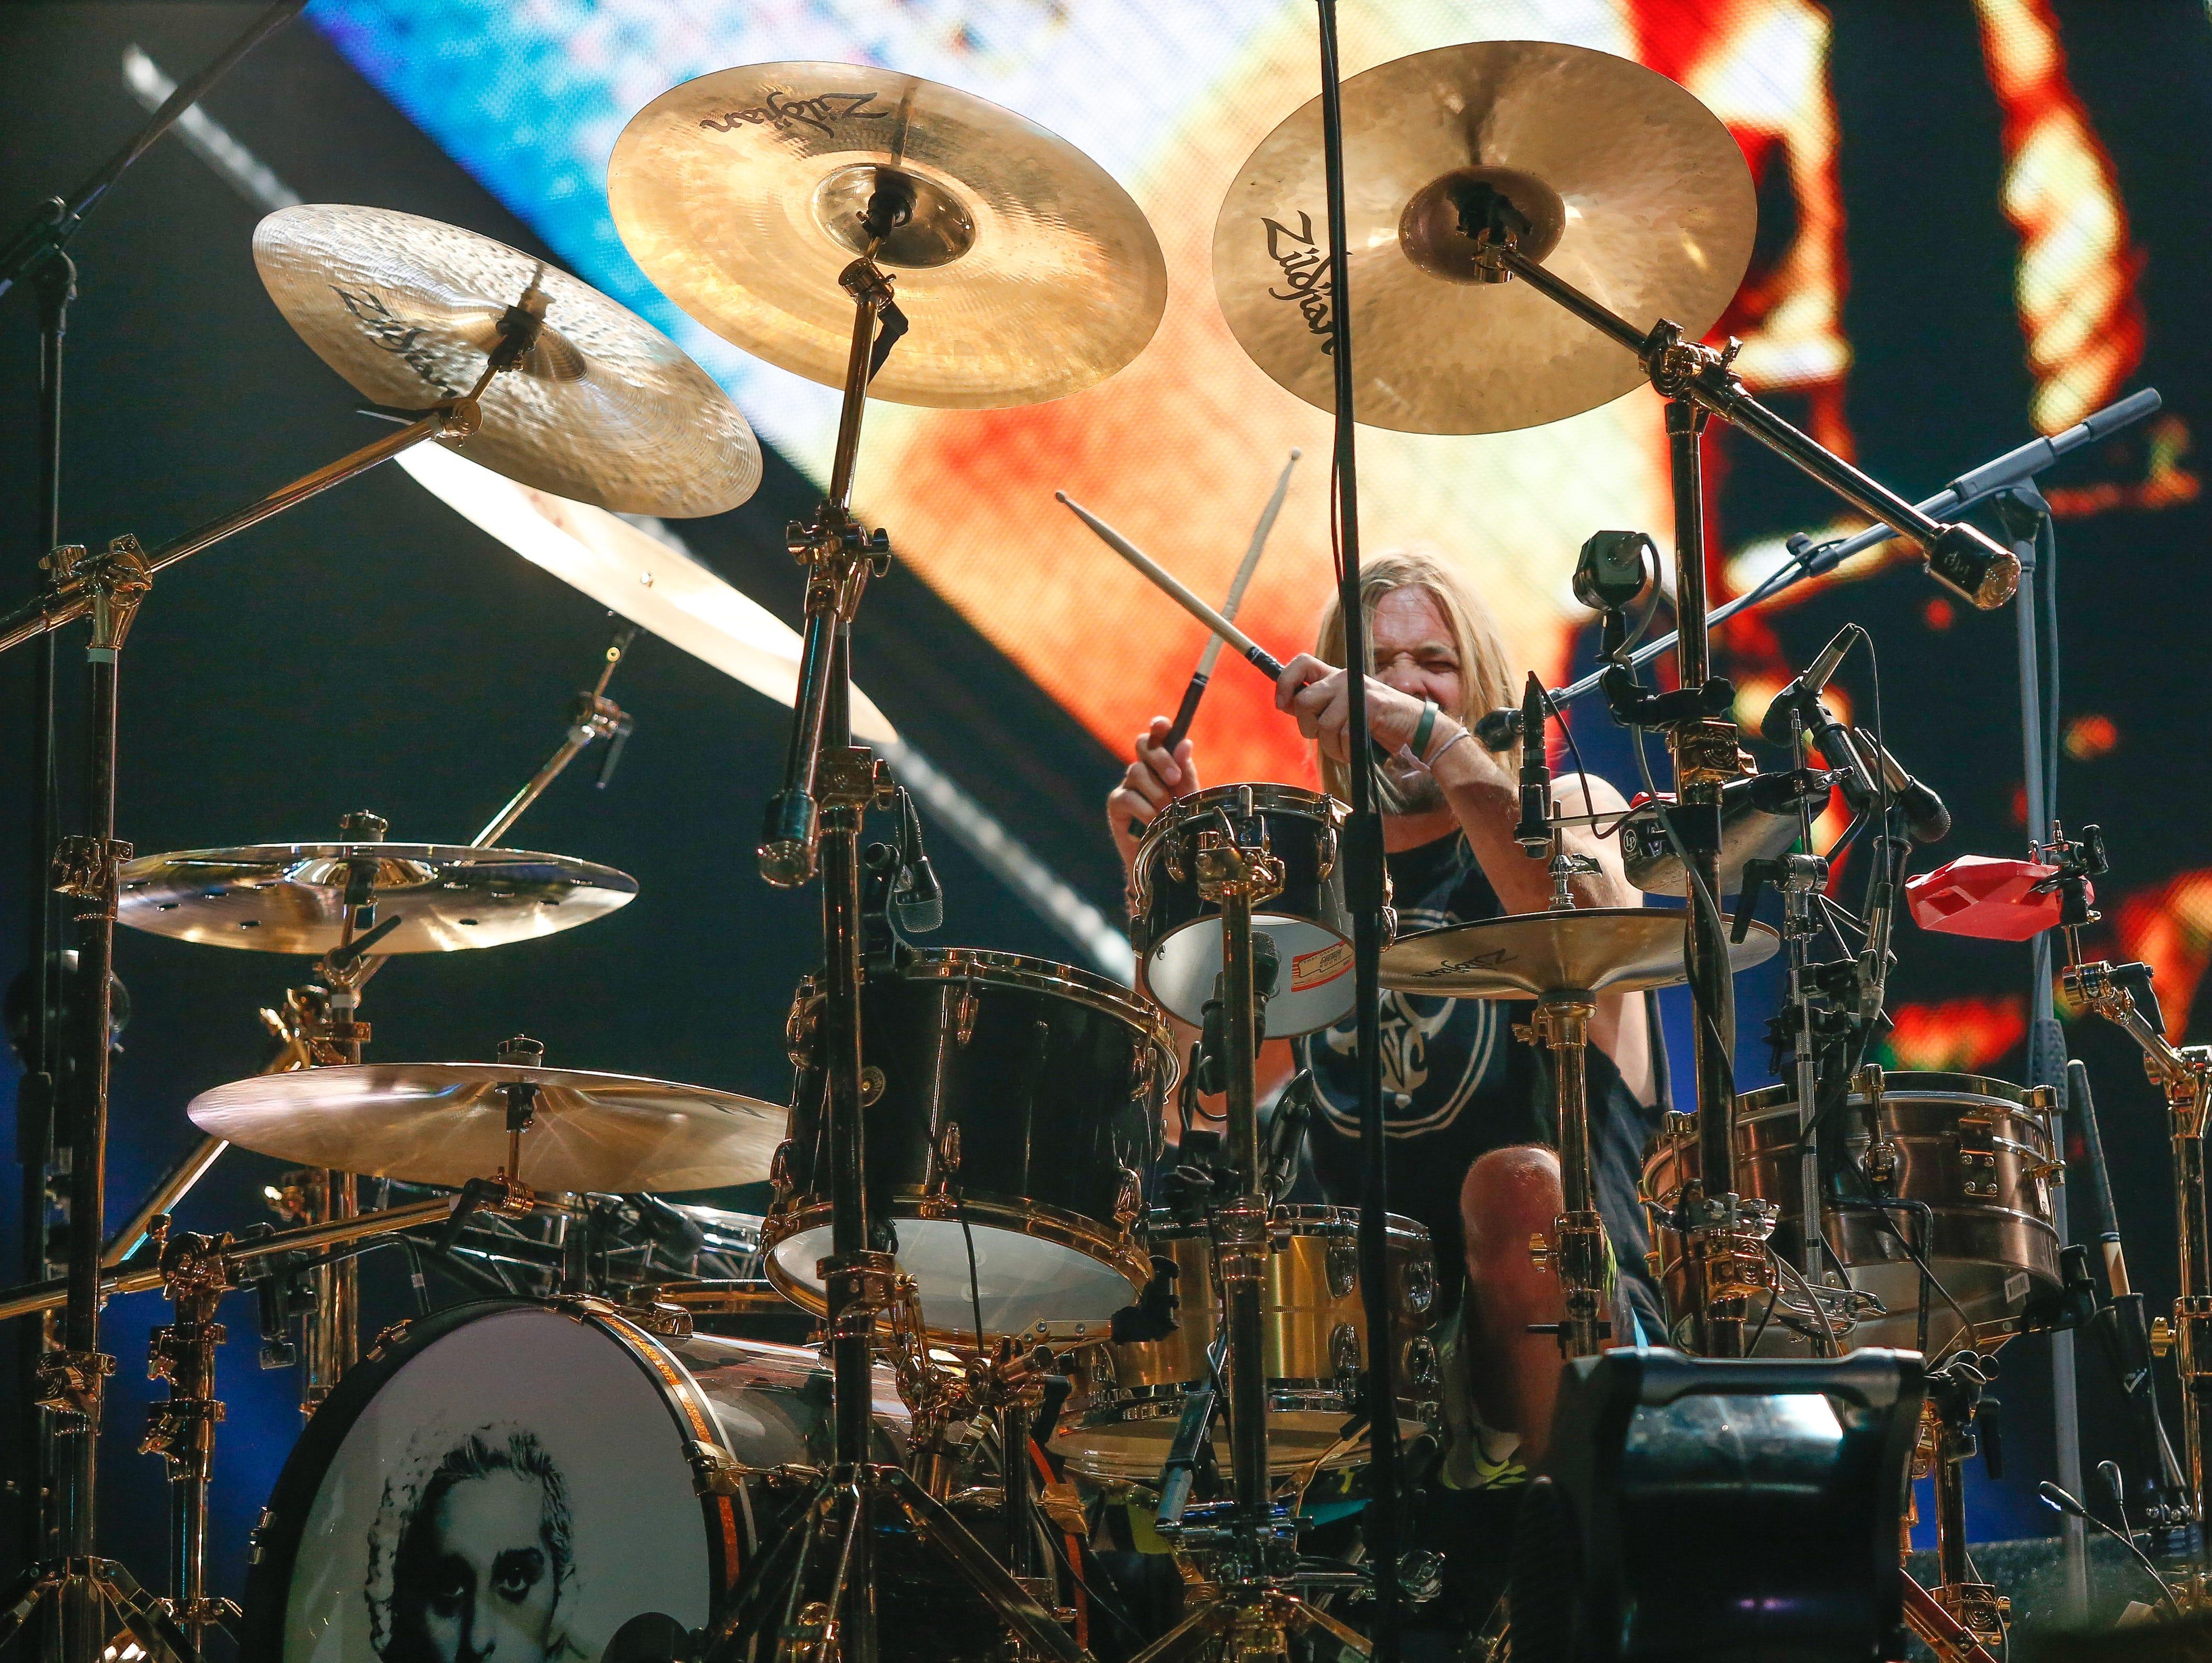 Drummer Taylor Hawkins of the Foo Fighters.